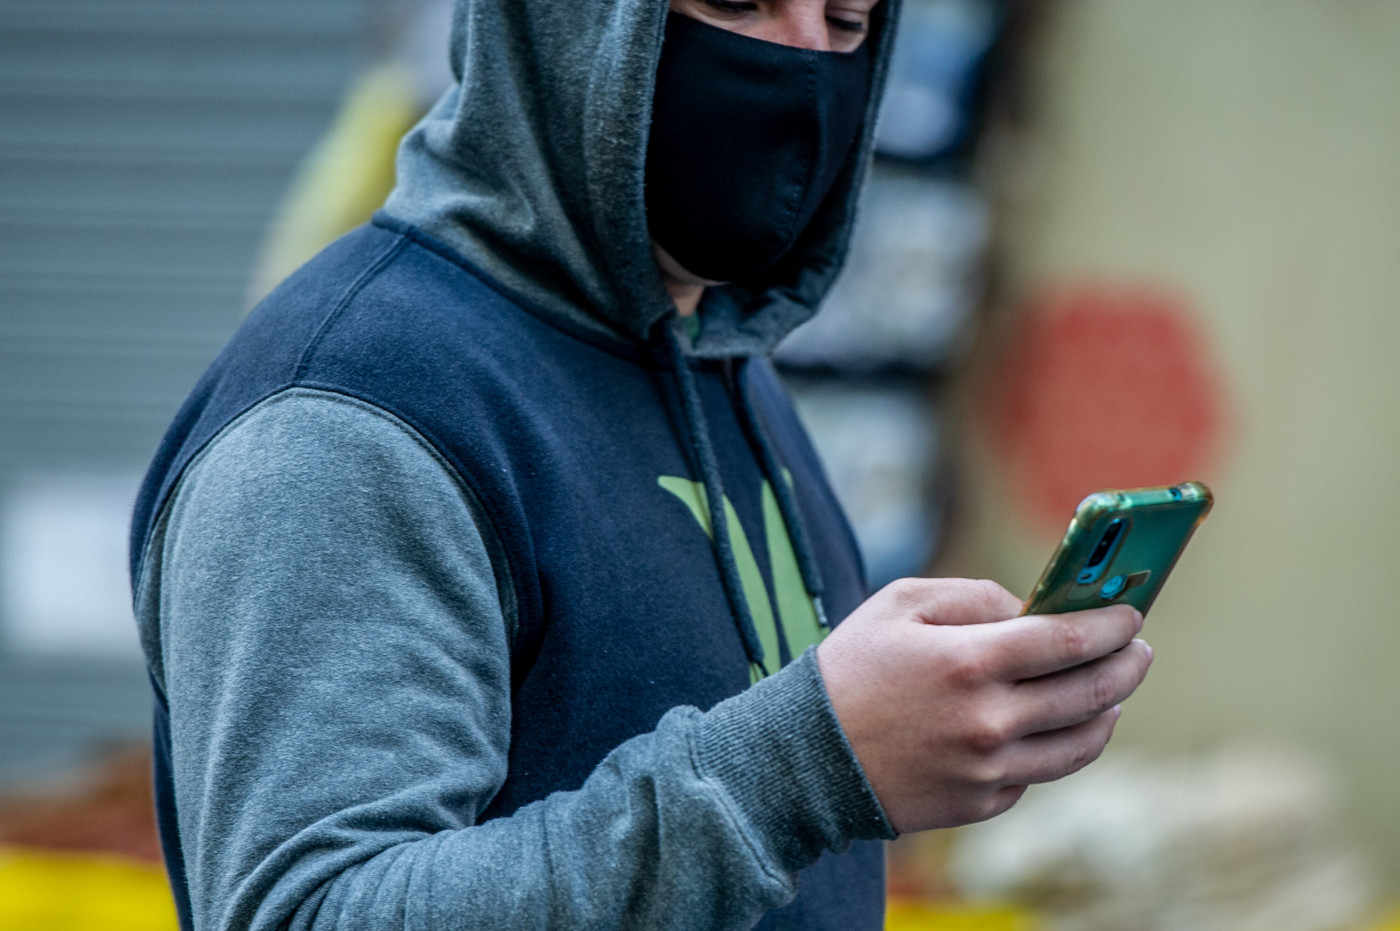 Usando máscara para se proteger do coronavírus, homem mexe no celular